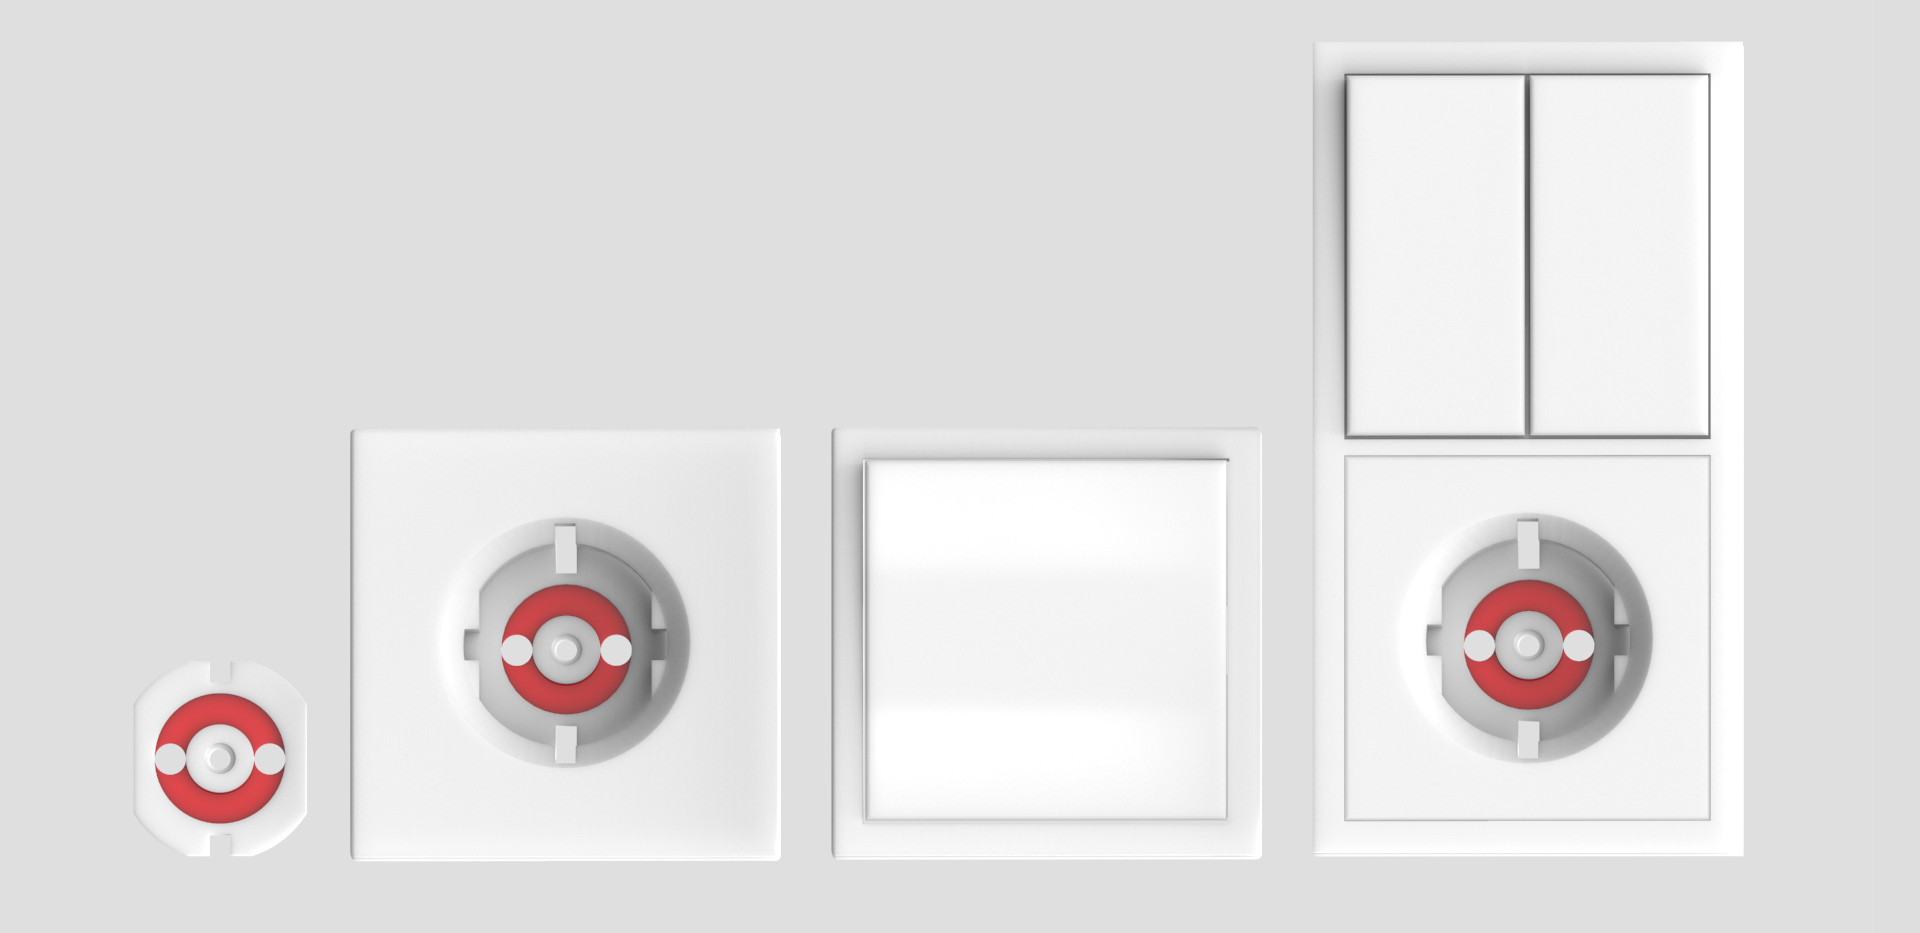 22 universal design socket2.jpg